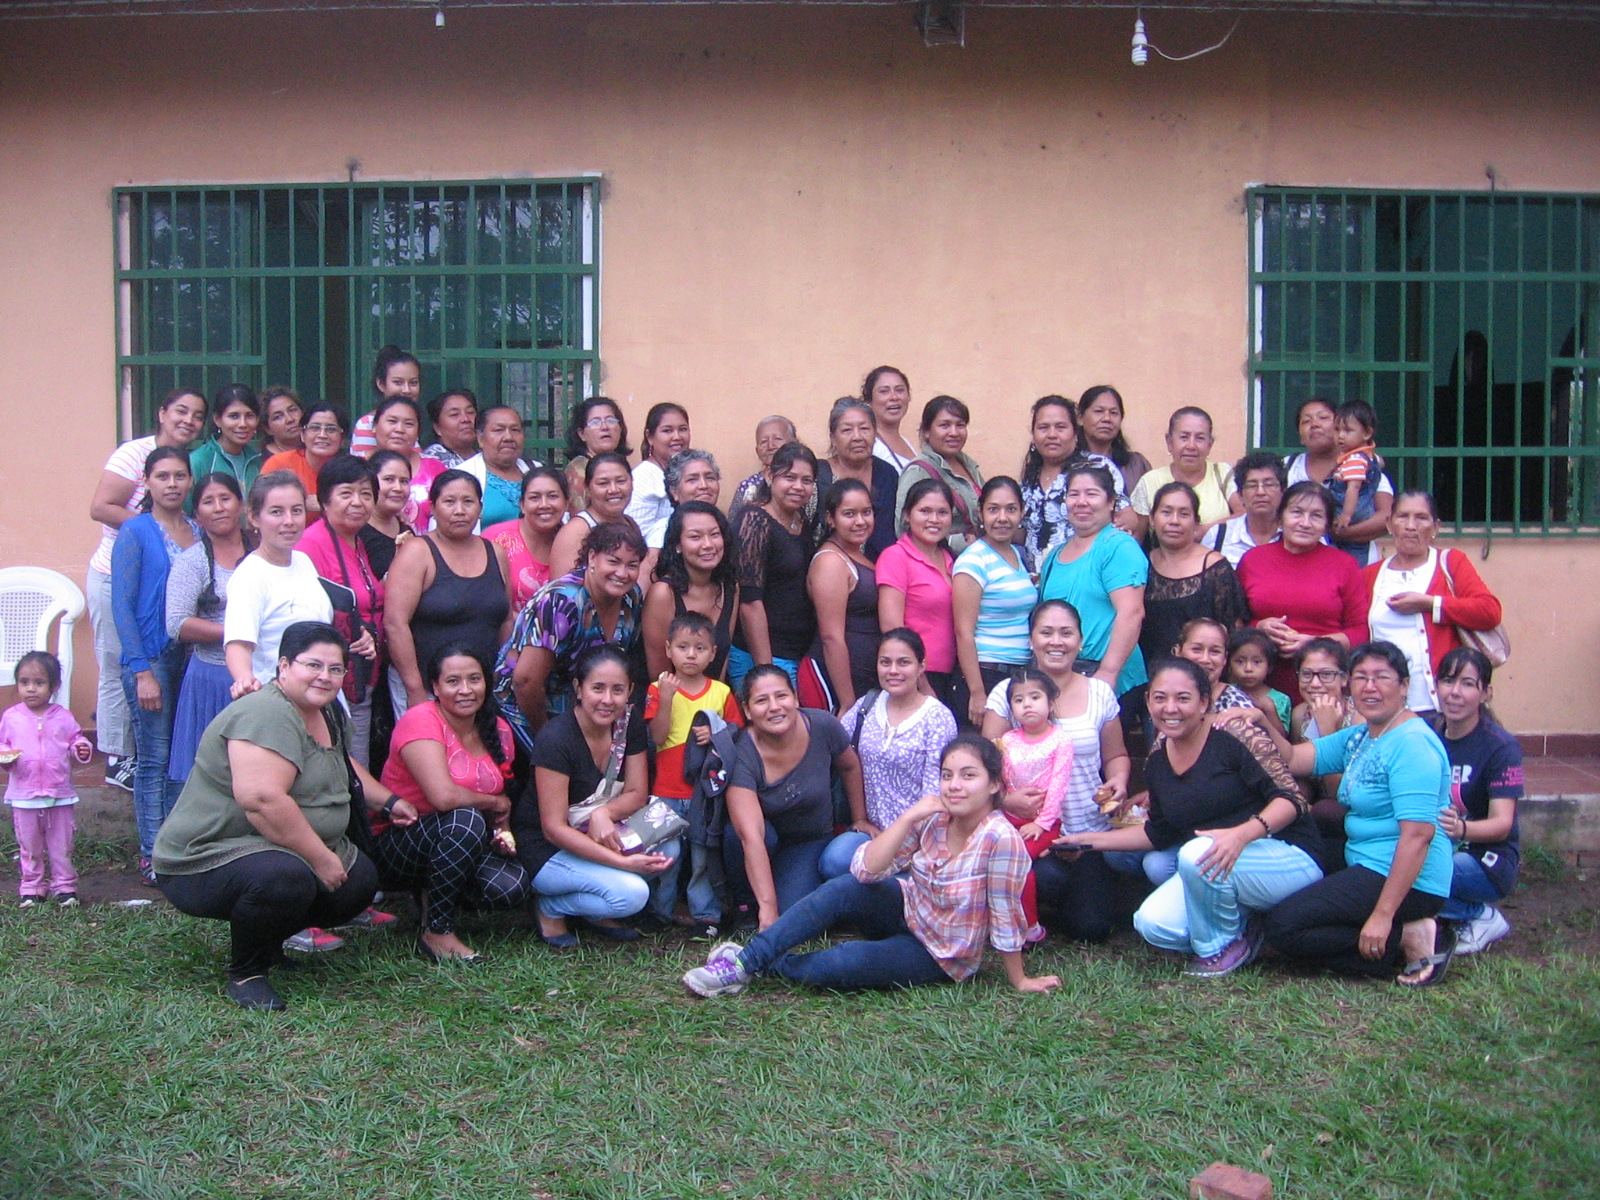 Retiro de mujeres de las iglesias menonitas en Bolivia.